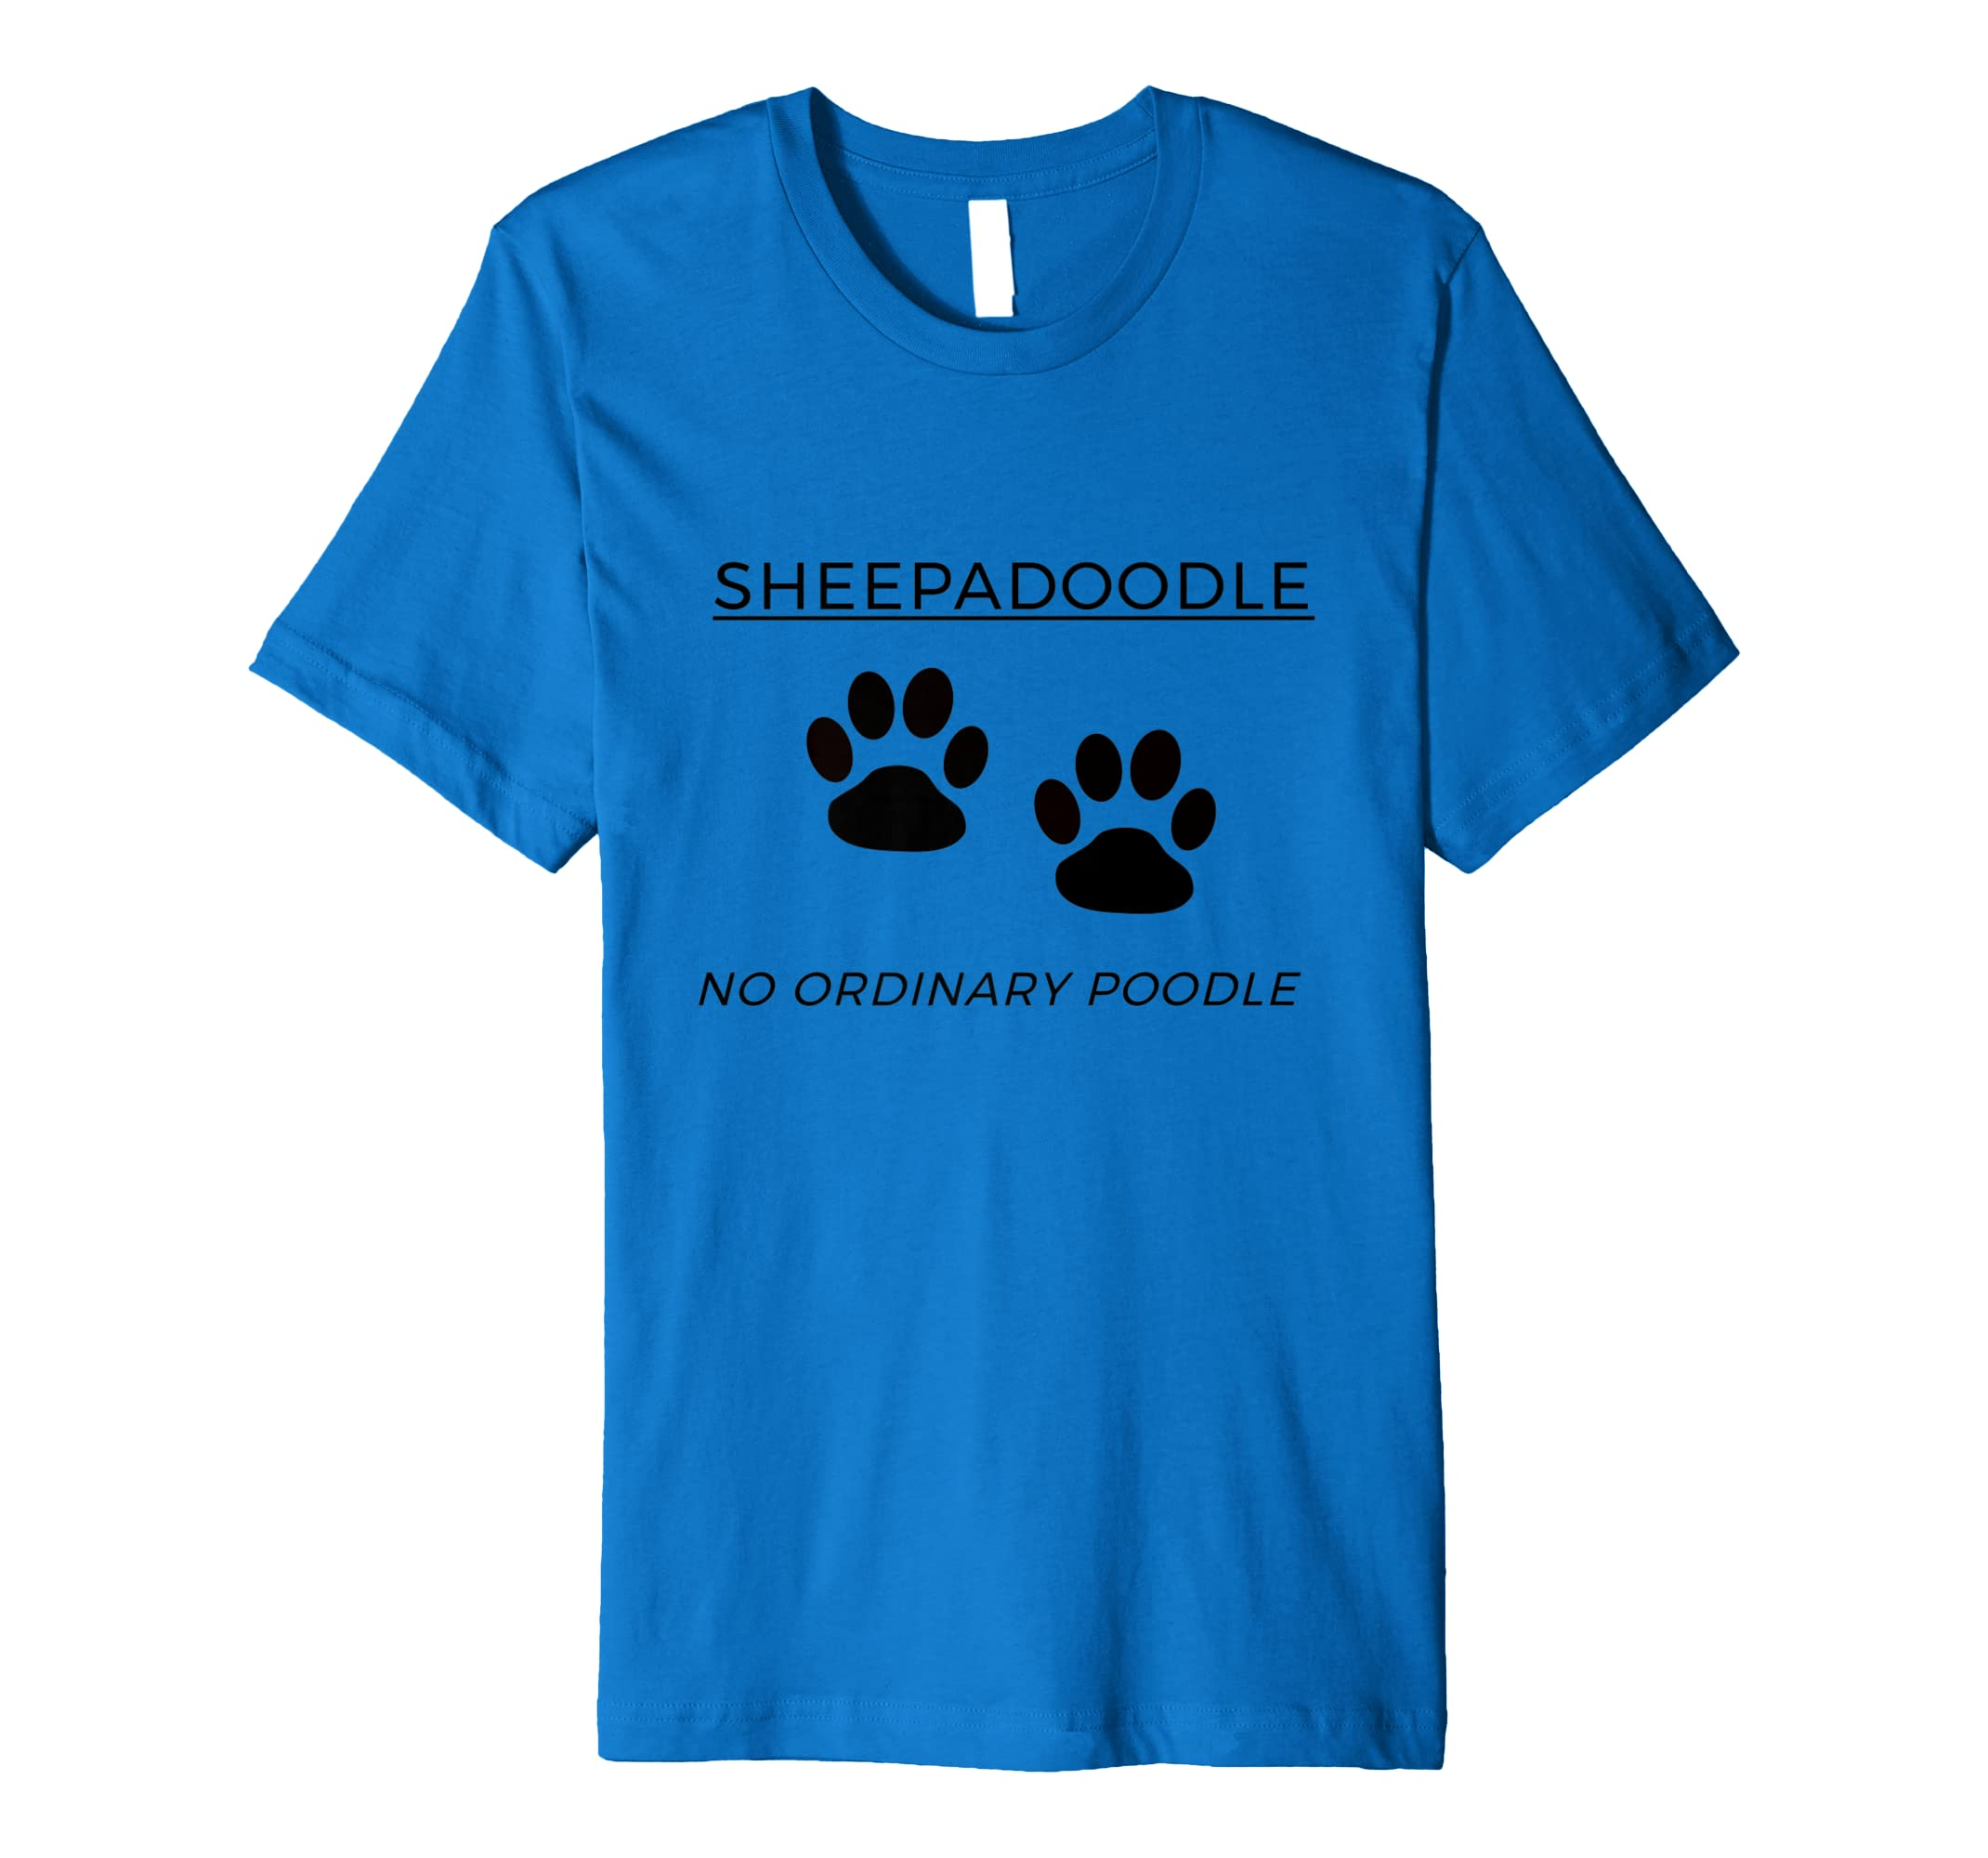 Amazon com: SHEEPADOODLE NO ORDINARY POODLE: Clothing